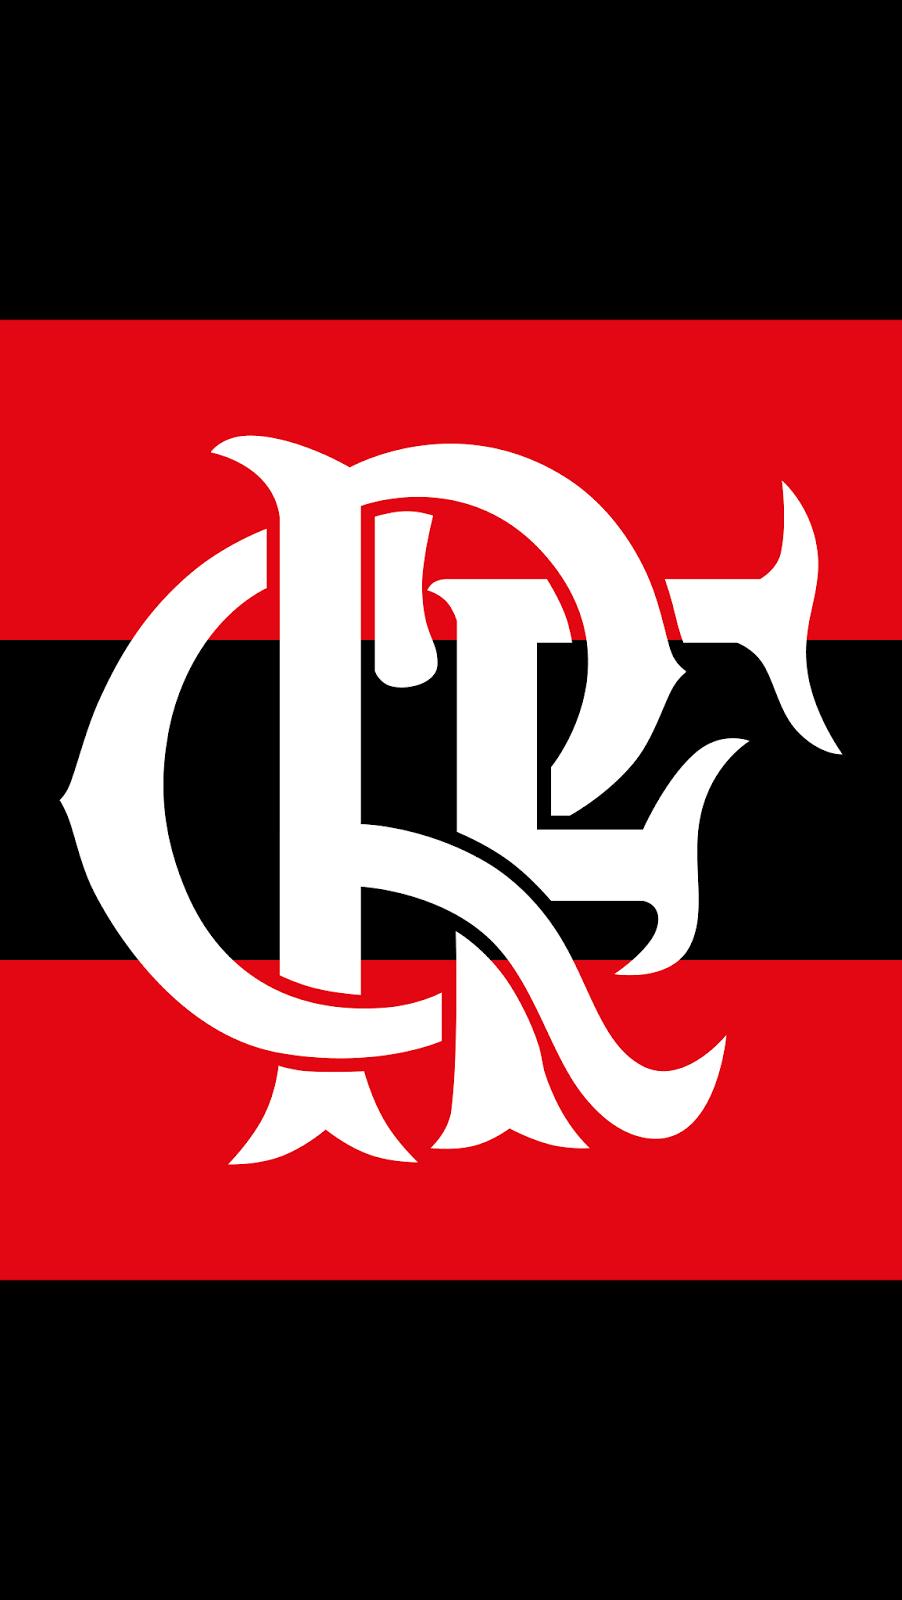 Wallpaper Flamengo para celular gratis